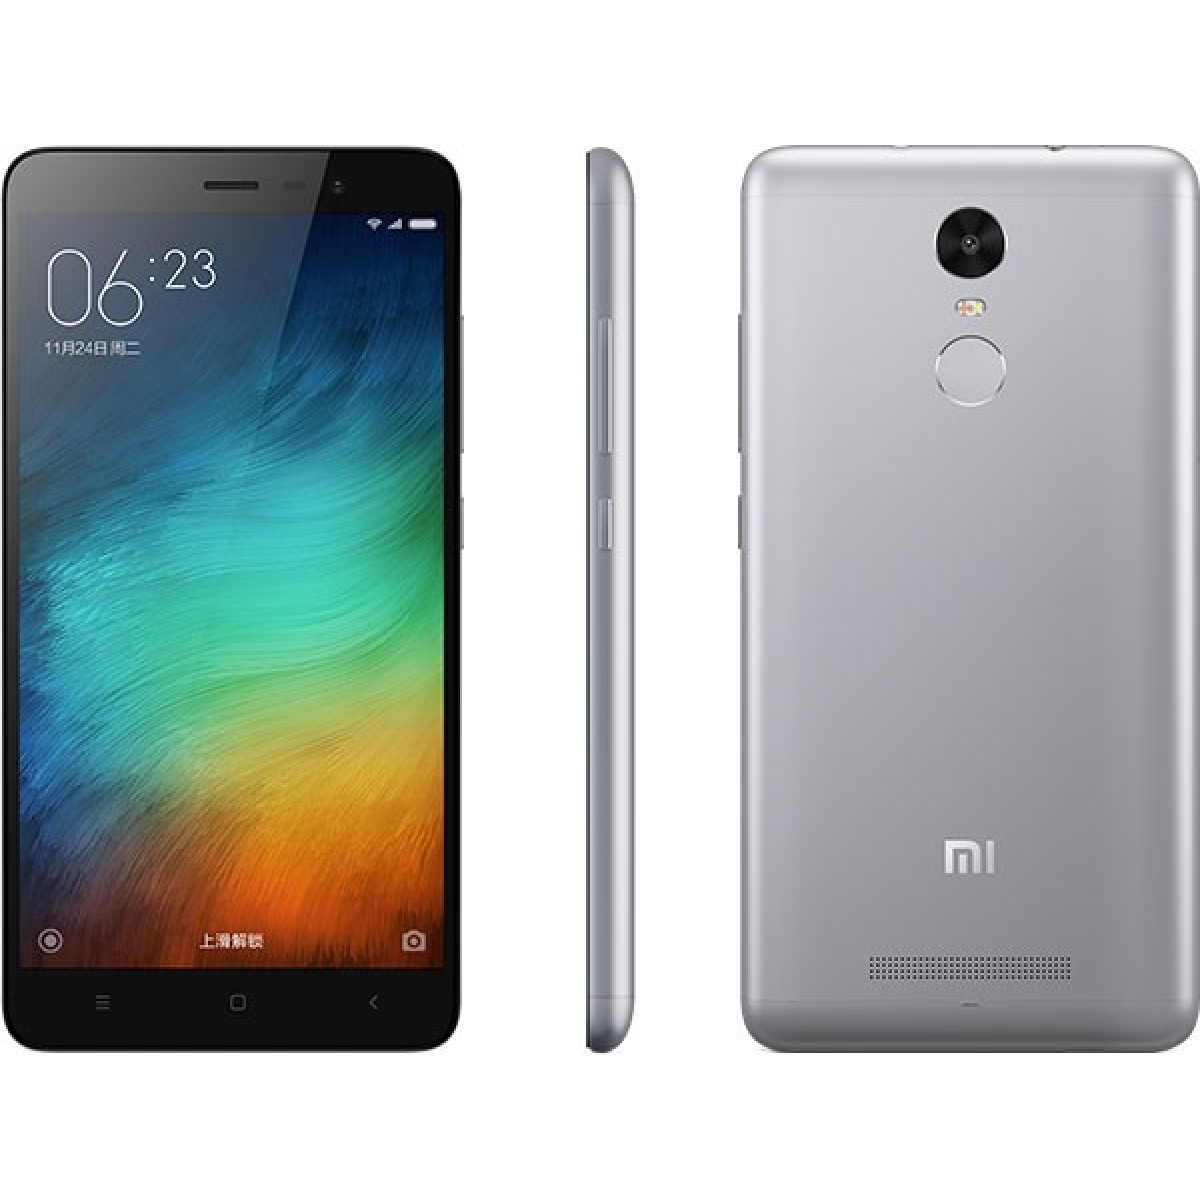 Xiaomi Redmi Note 3 Pro, 16 GB - šedý PH2210